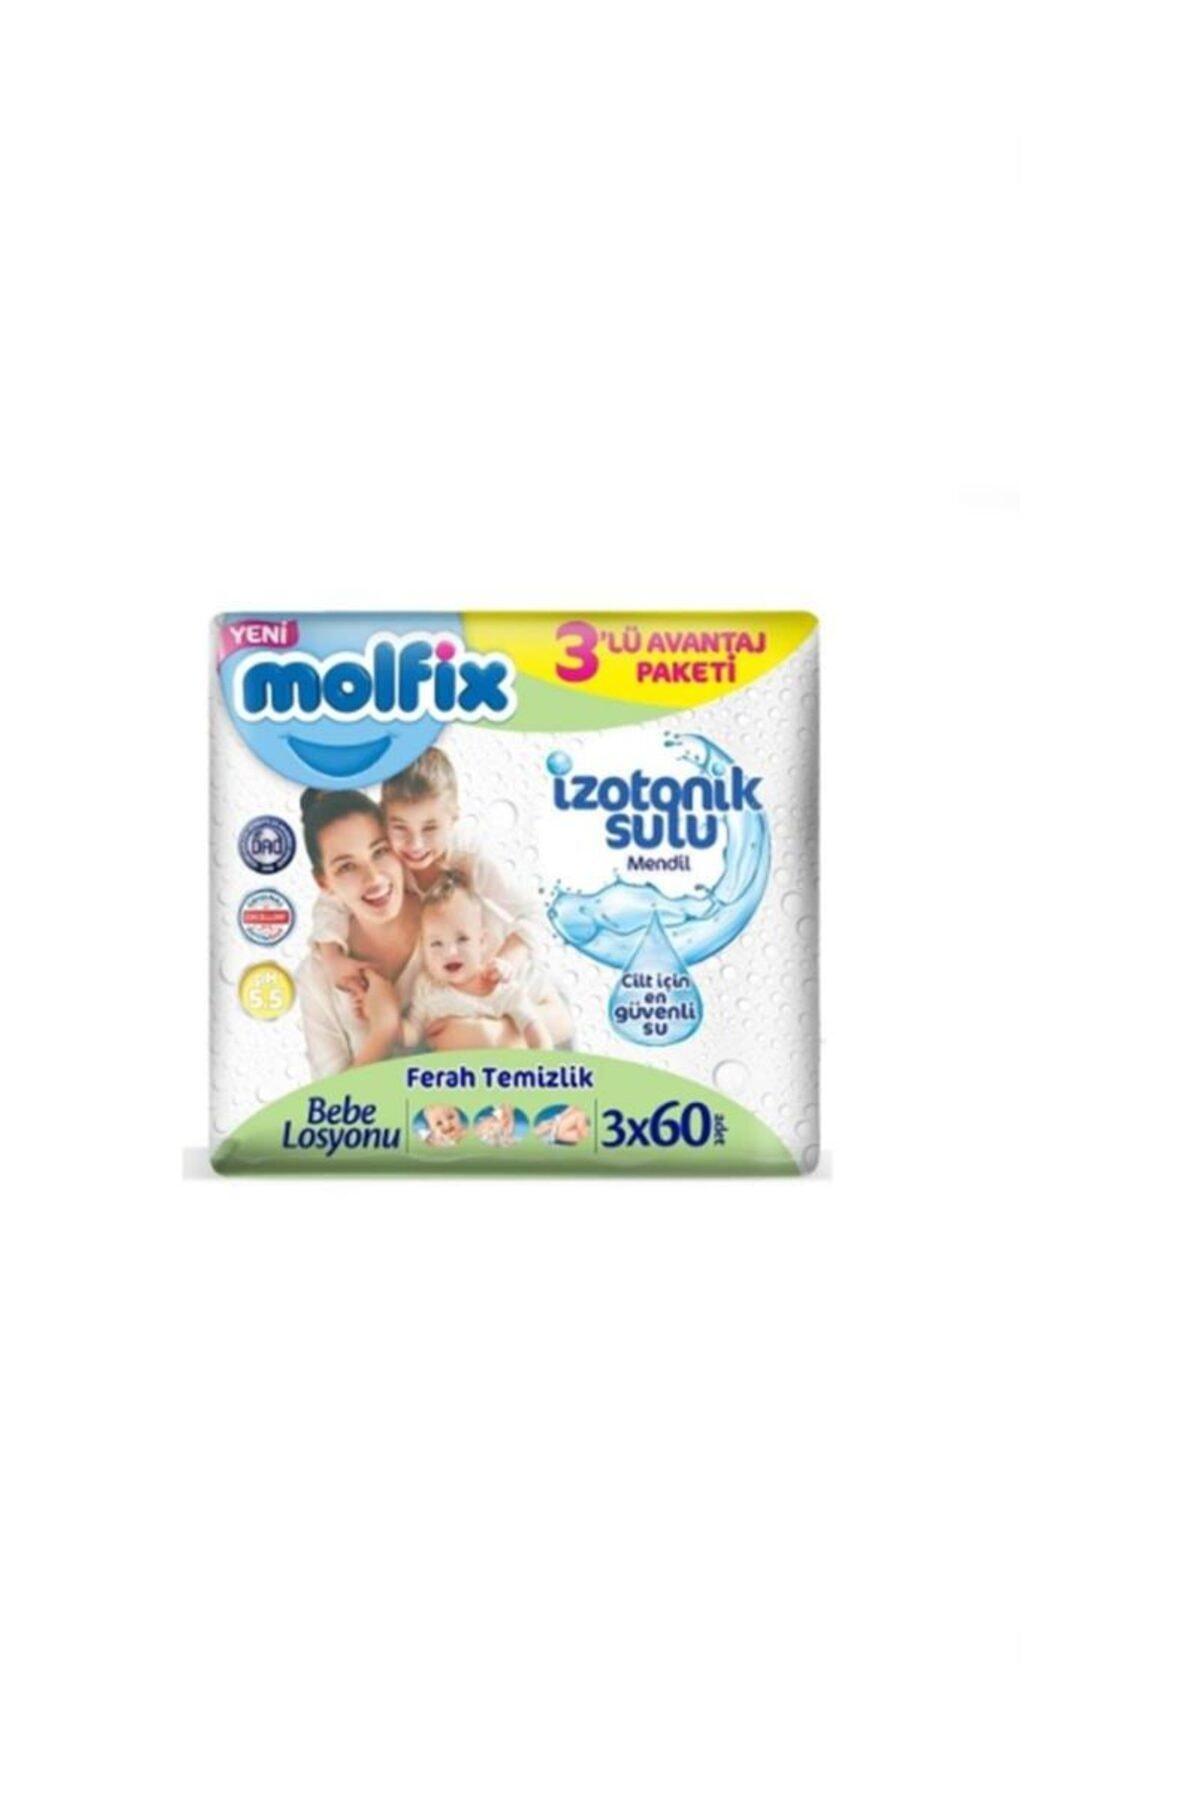 Molfix İzotonik Islak Havlu Ferah Temizlik 3'lü Paket 180 Yaprak 2